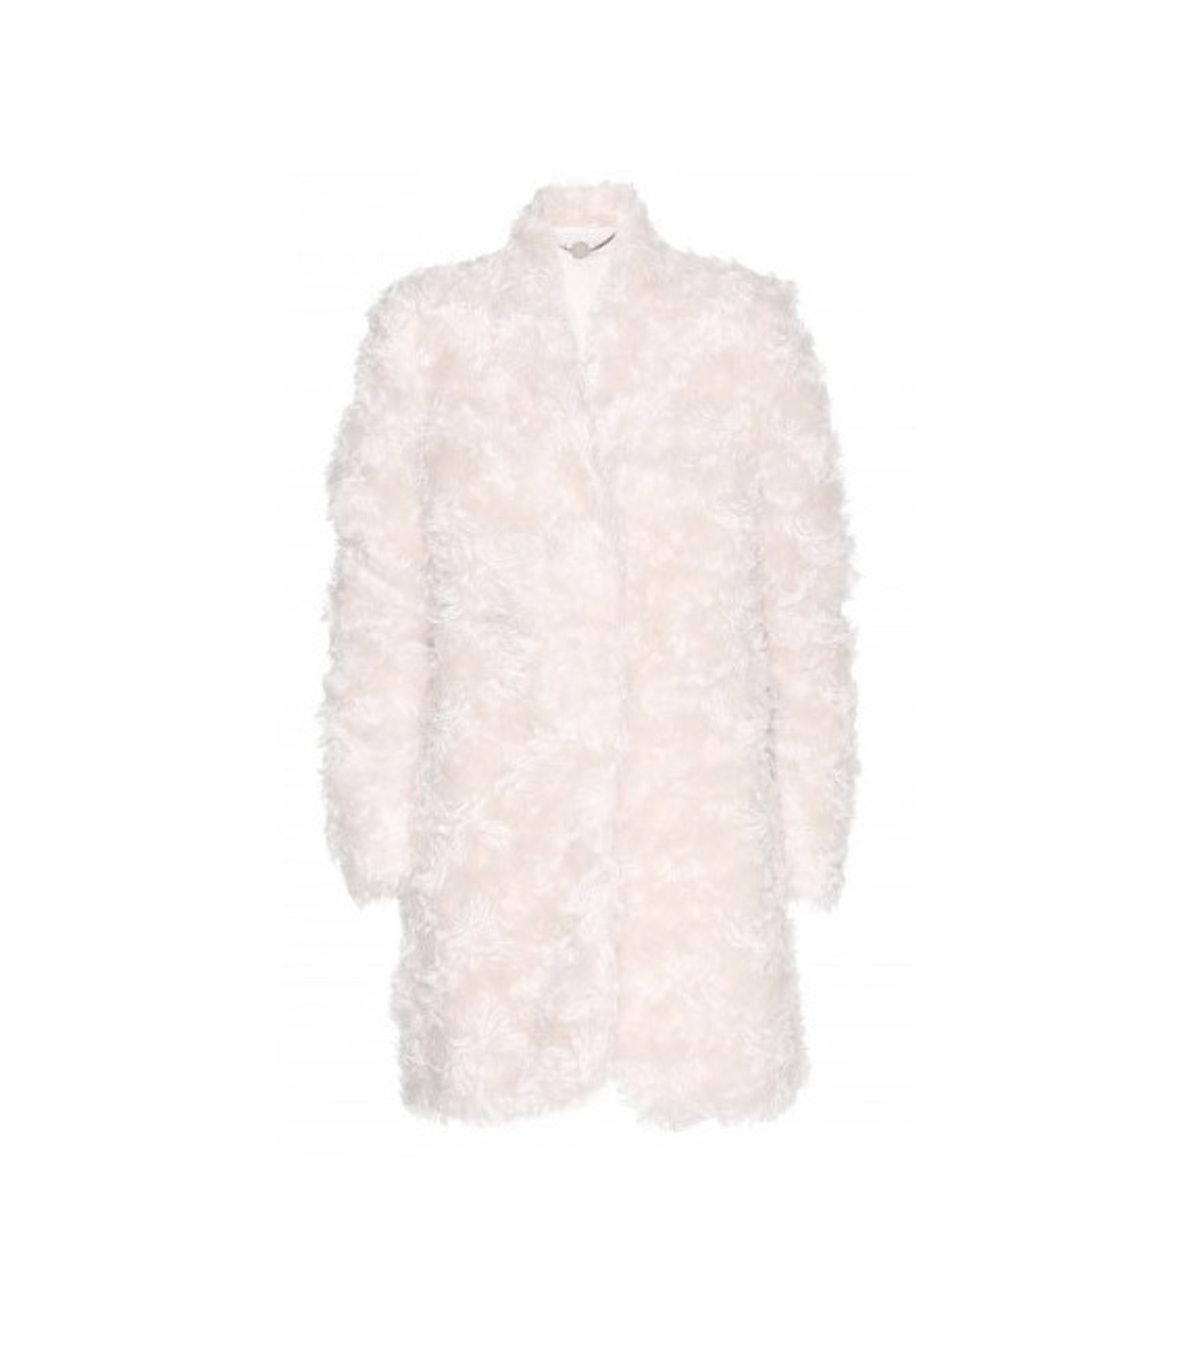 Grin and fake it with this great teddy bear coat from Stella McCartney. *Stella McCartney Bryce faux fur coat, $1883, [mytheresa.com](http://www.mytheresa.com/en-us/mantel-bryce.html).*